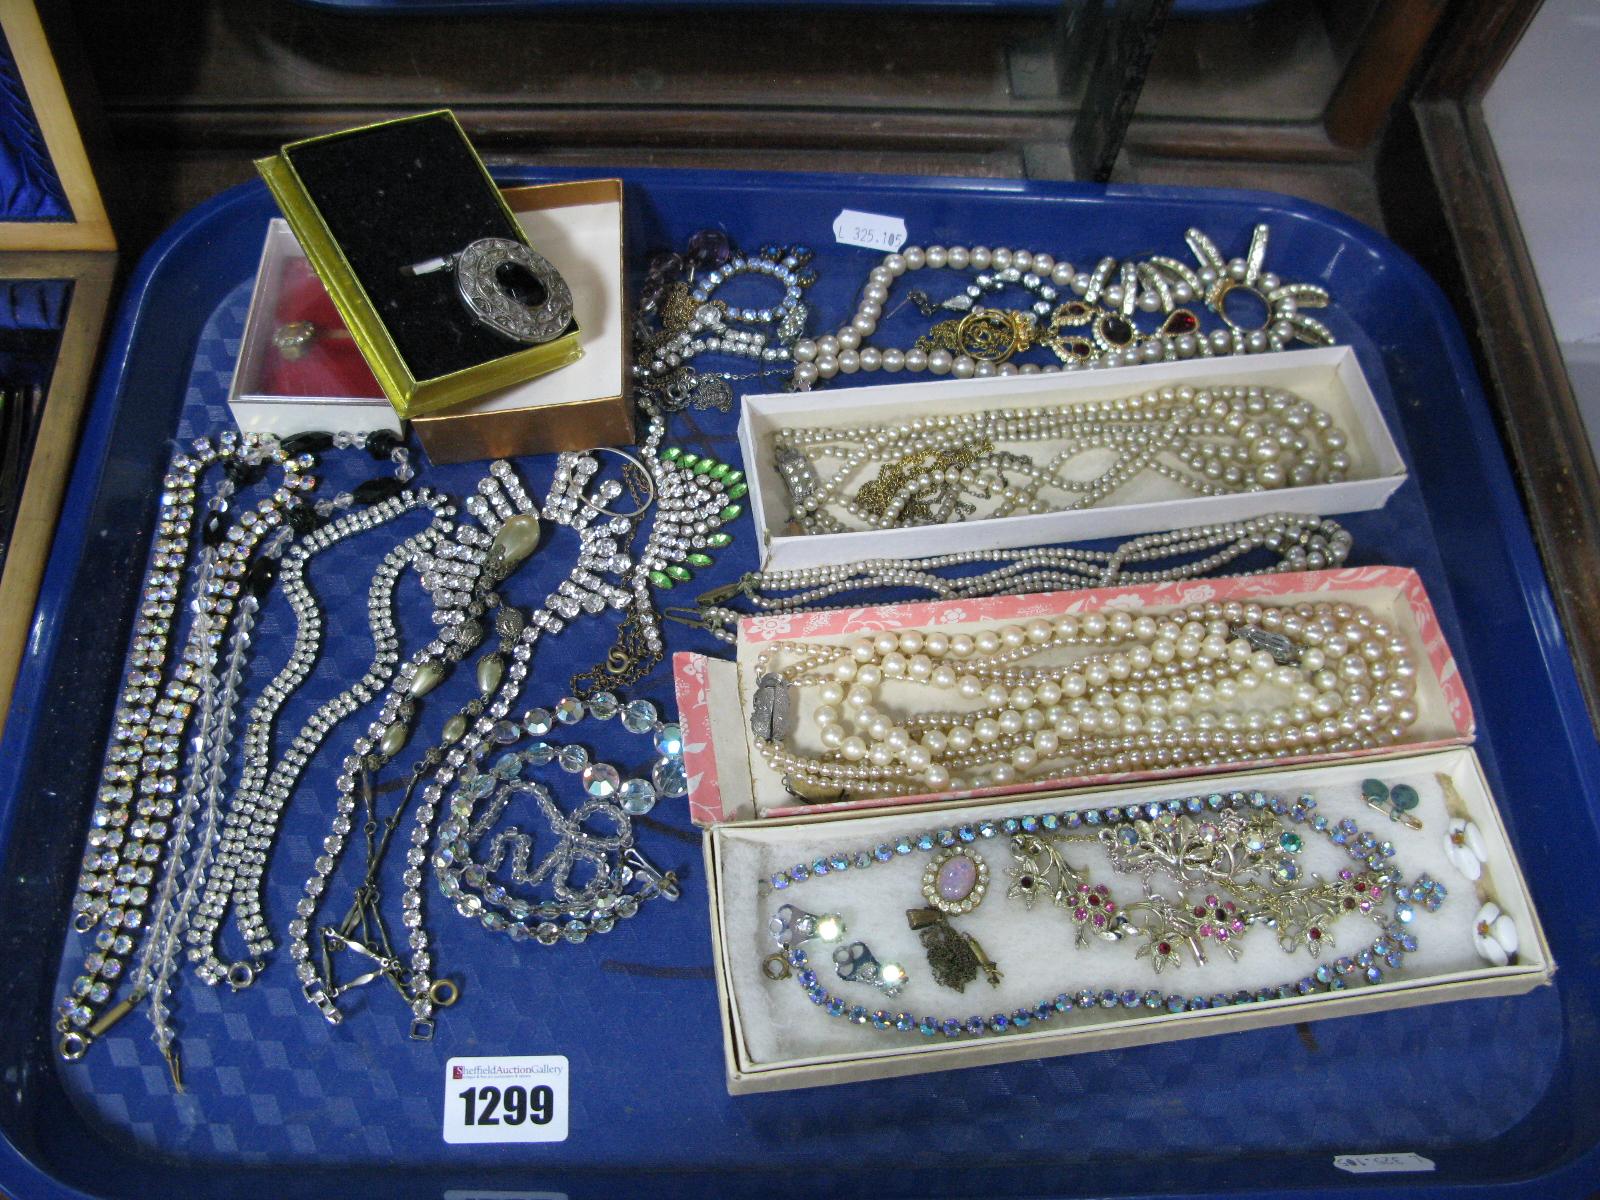 Lot 1299 - Imitation Pearls, diamanté necklaces, dress rings, etc:- One Tray